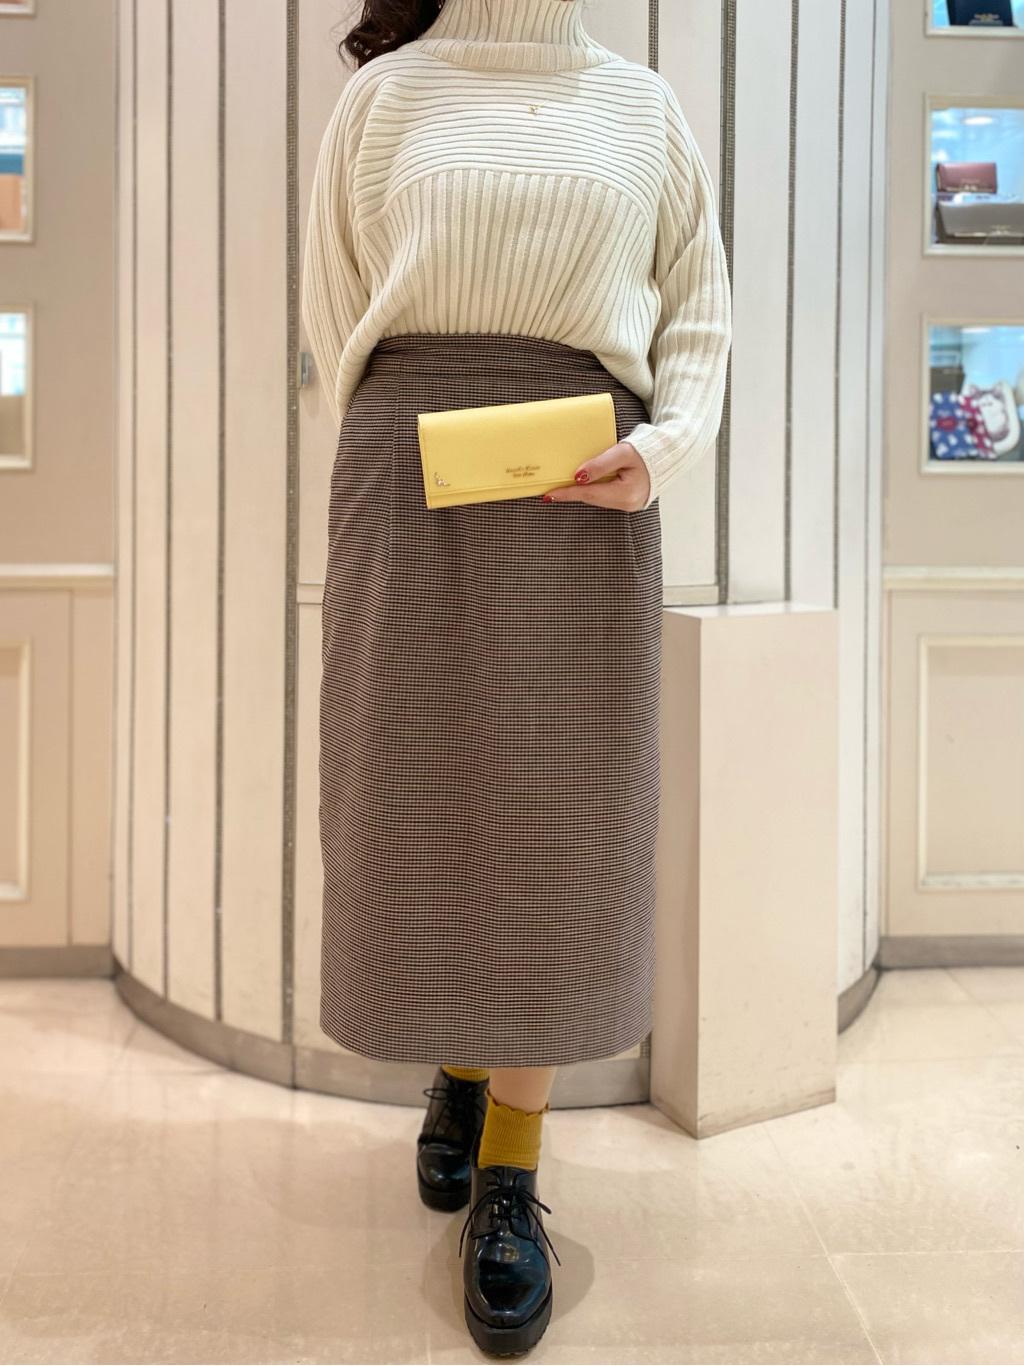 PC浦和パルコ店 Tomoyo.·˖*✩